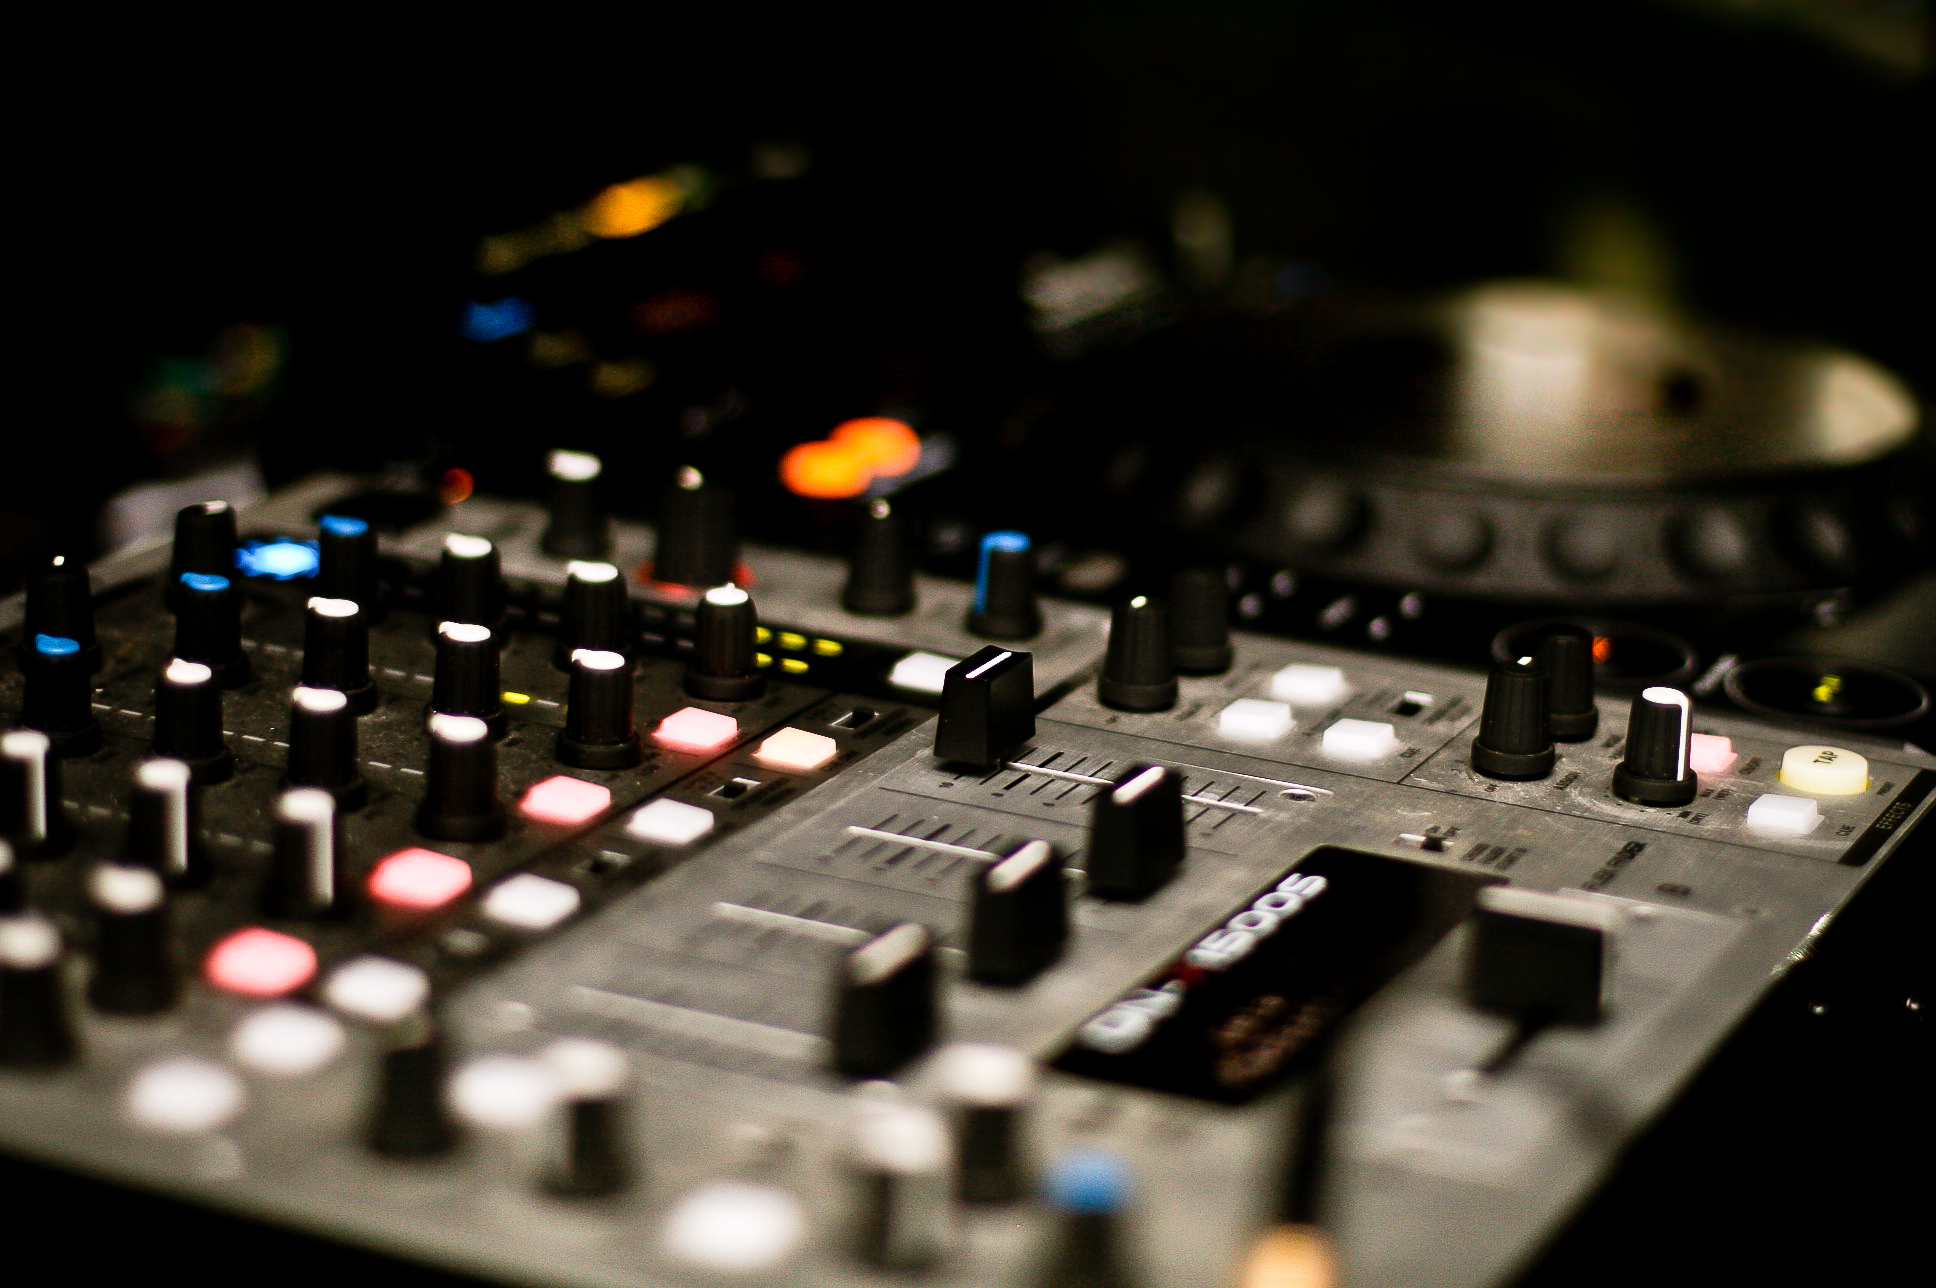 DJ Mix in The Club Free Stock Photo